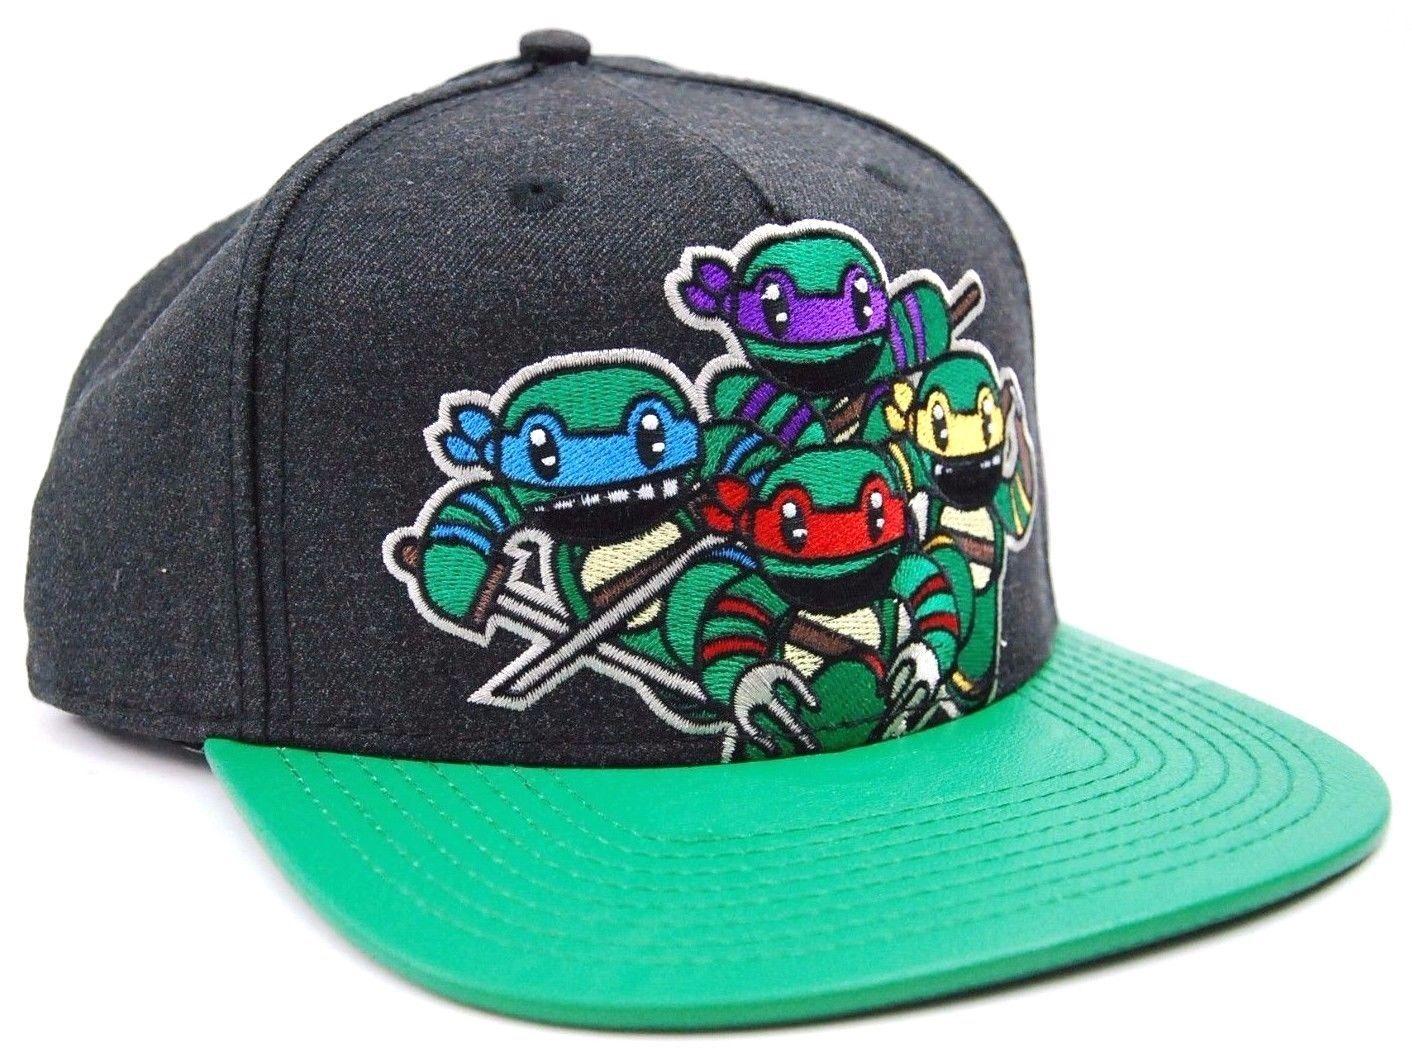 Nickelodeon Teenage Mutant Ninja Turtles Attack Textured Bill Snapback Cap Hat